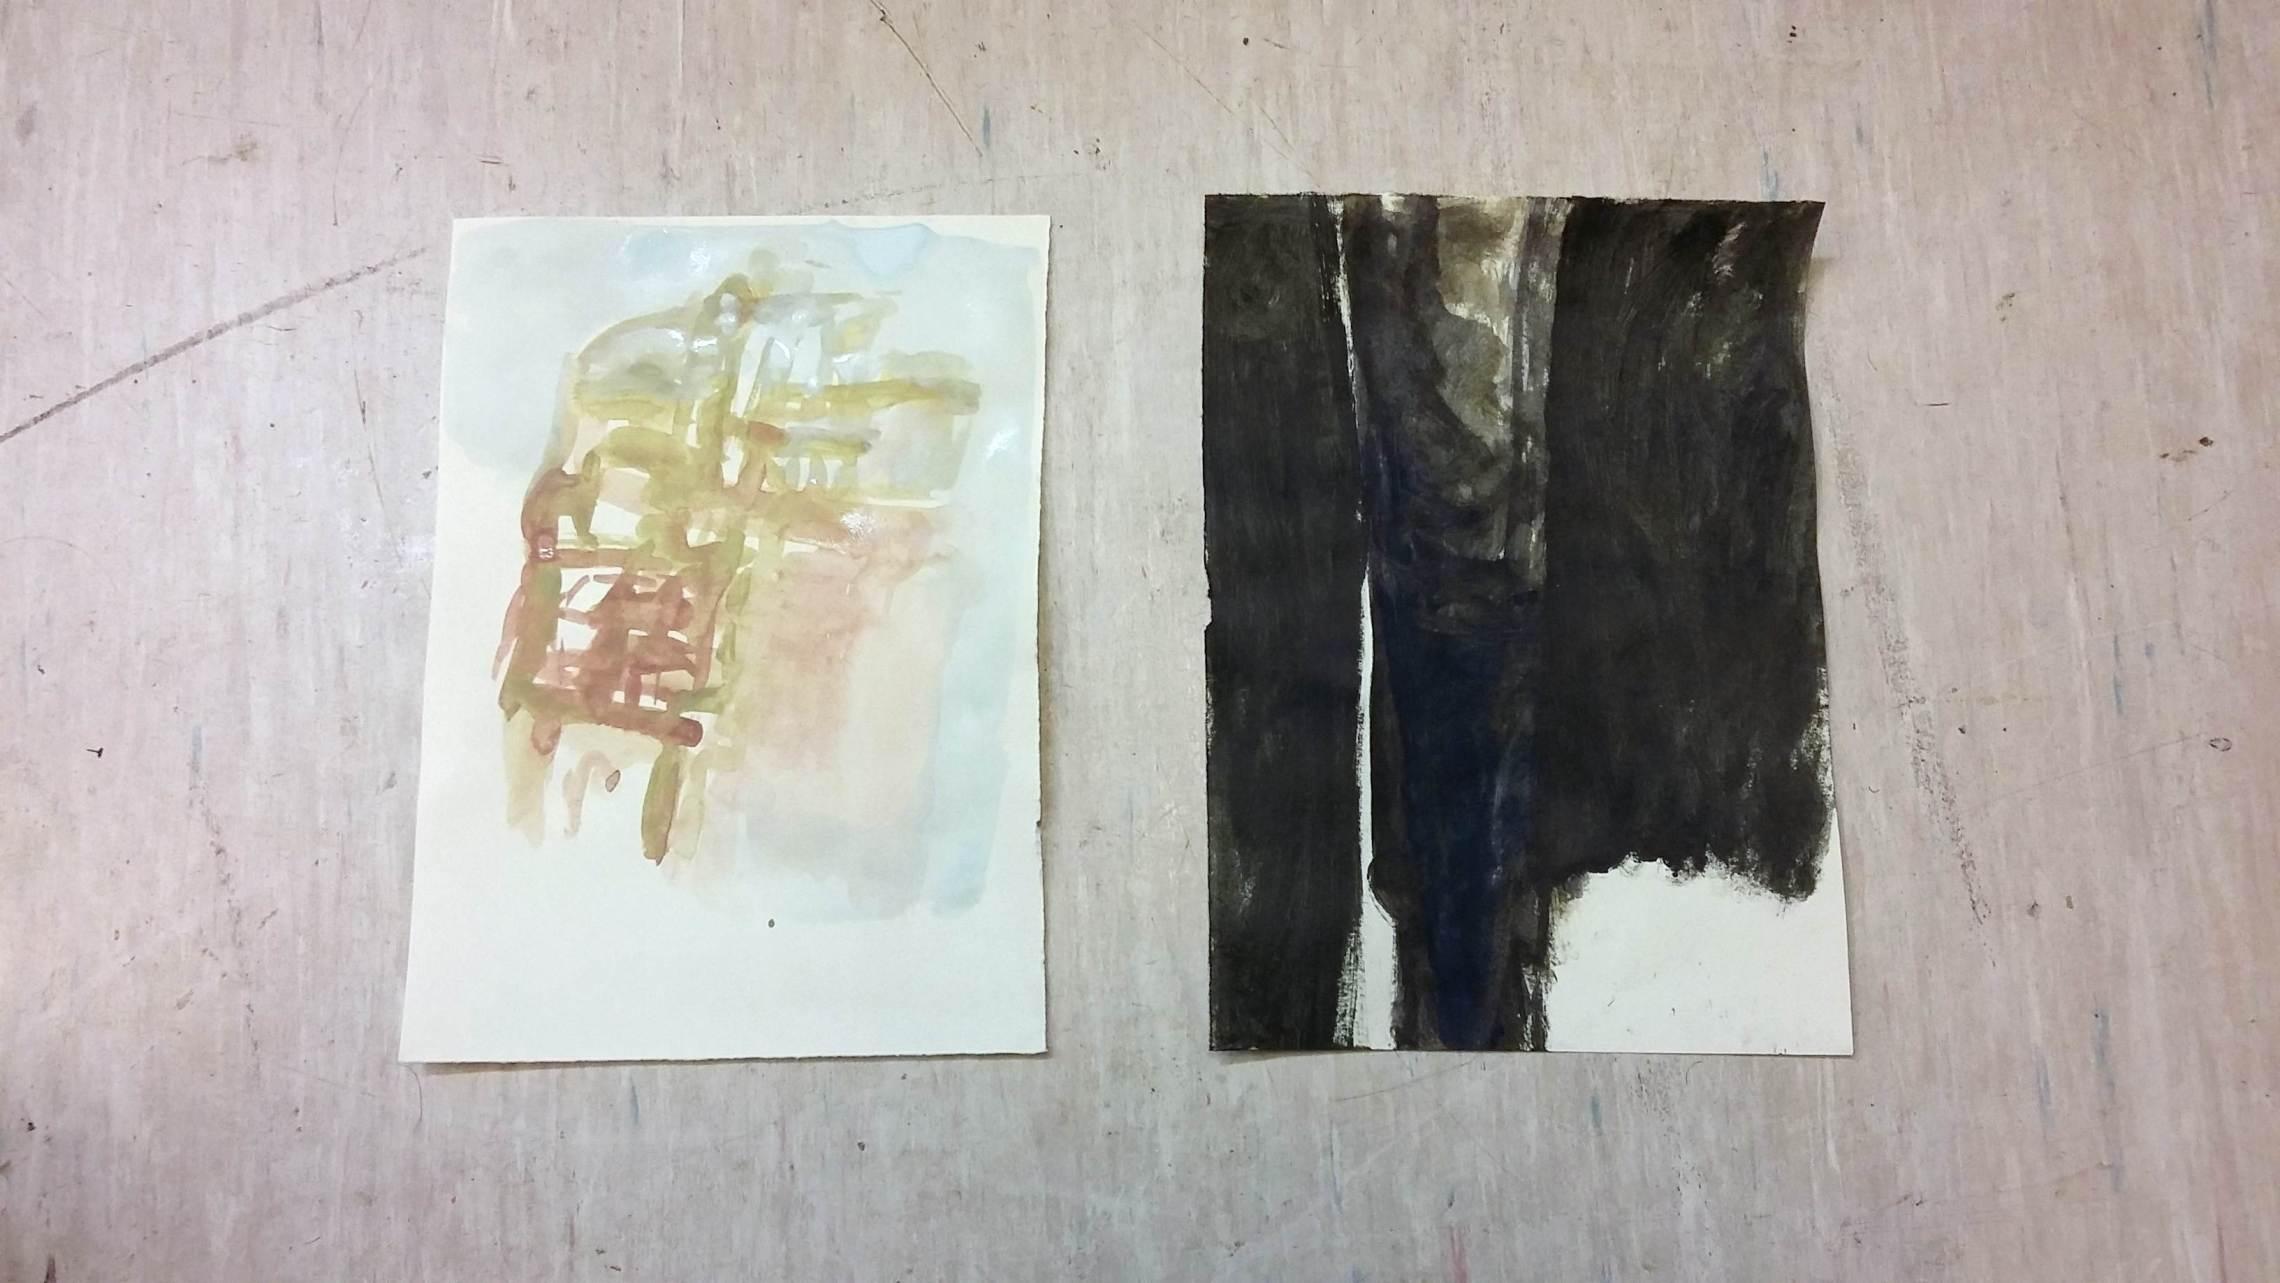 image7_sketchesstudioiceland_2015_watercolourandoilonpaper.jpg